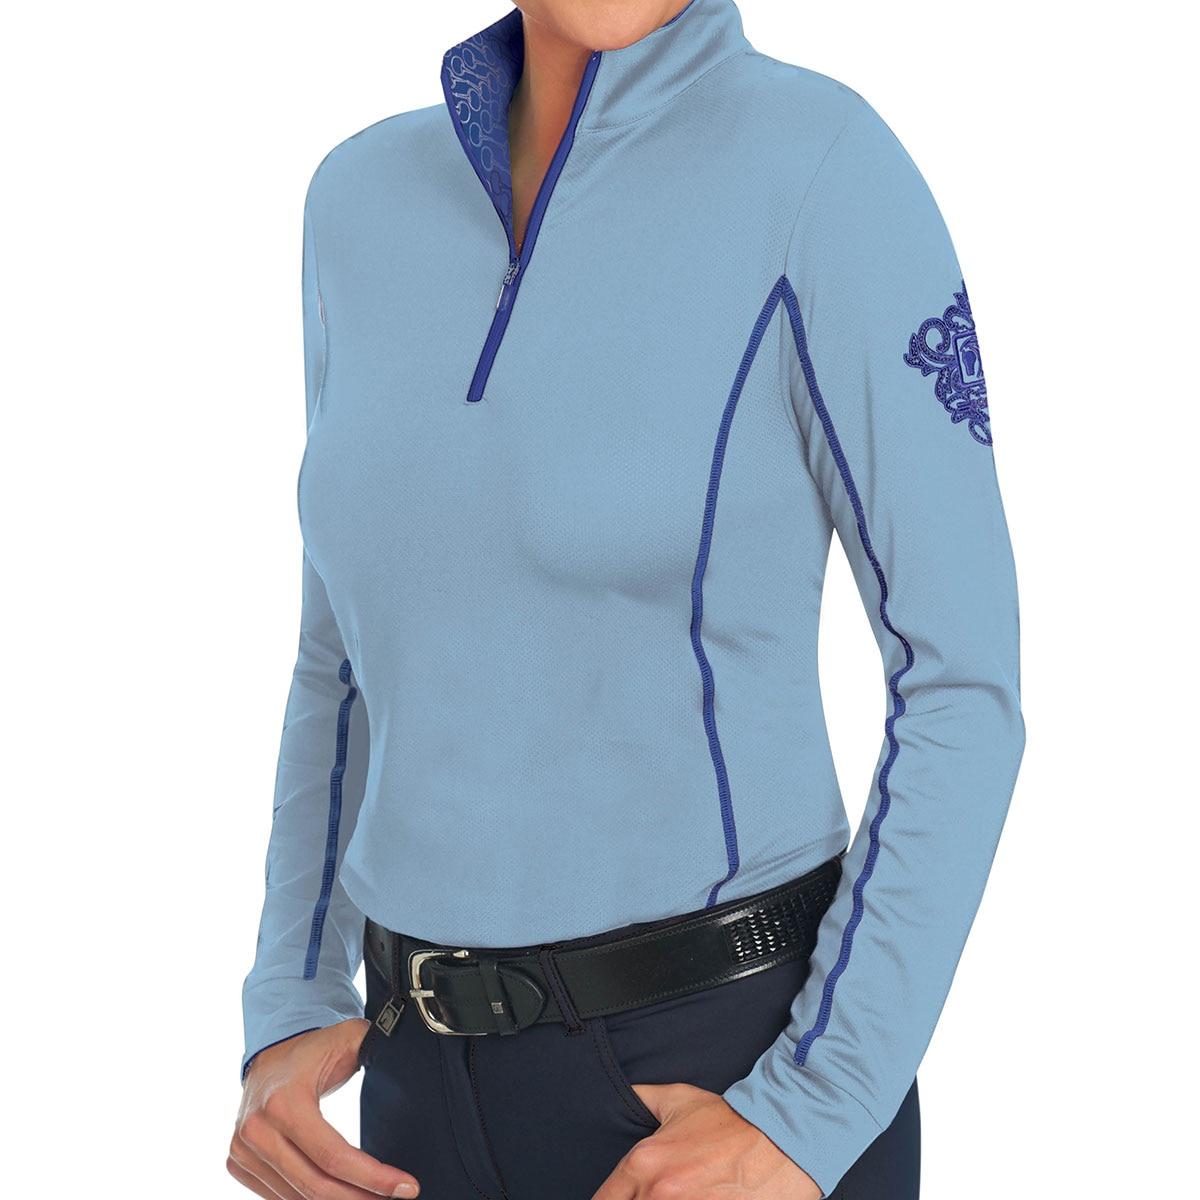 New Romfh Chill Factor Ladies Sun Shirt Navy//grey Mist Small